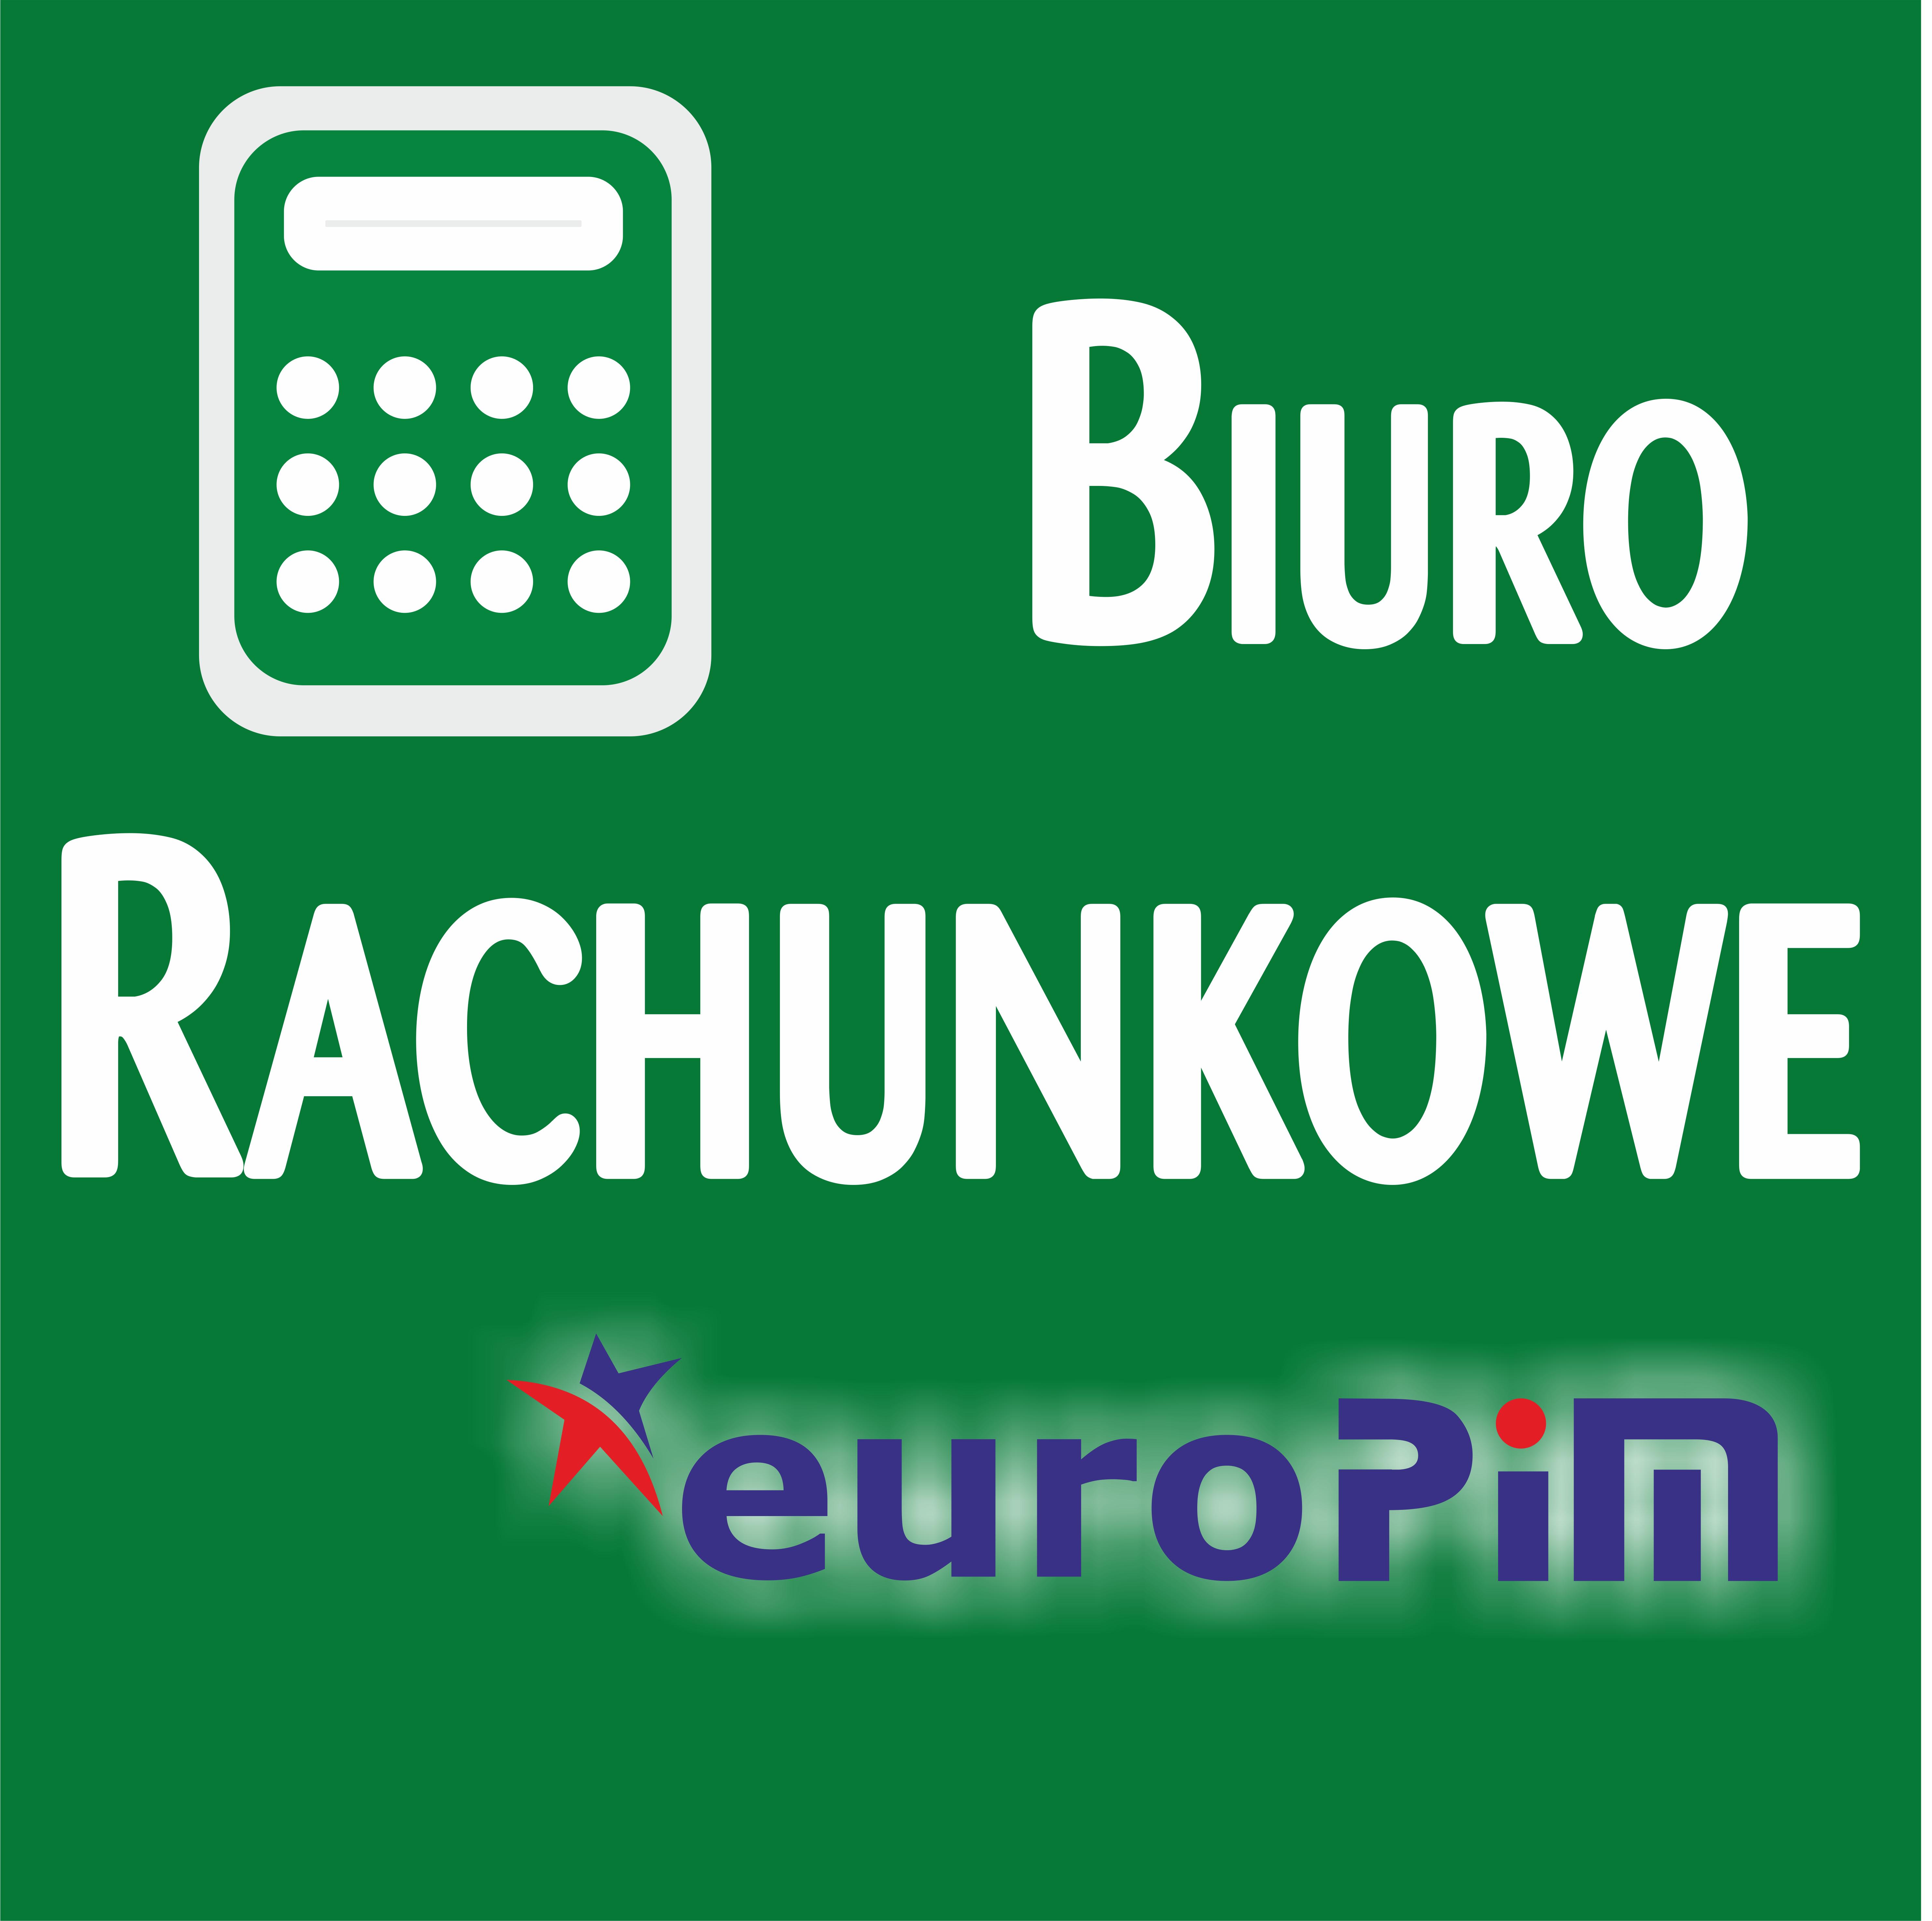 [BR] Biuro Rachunkowe EUROPIM!! start 5 marca 2014